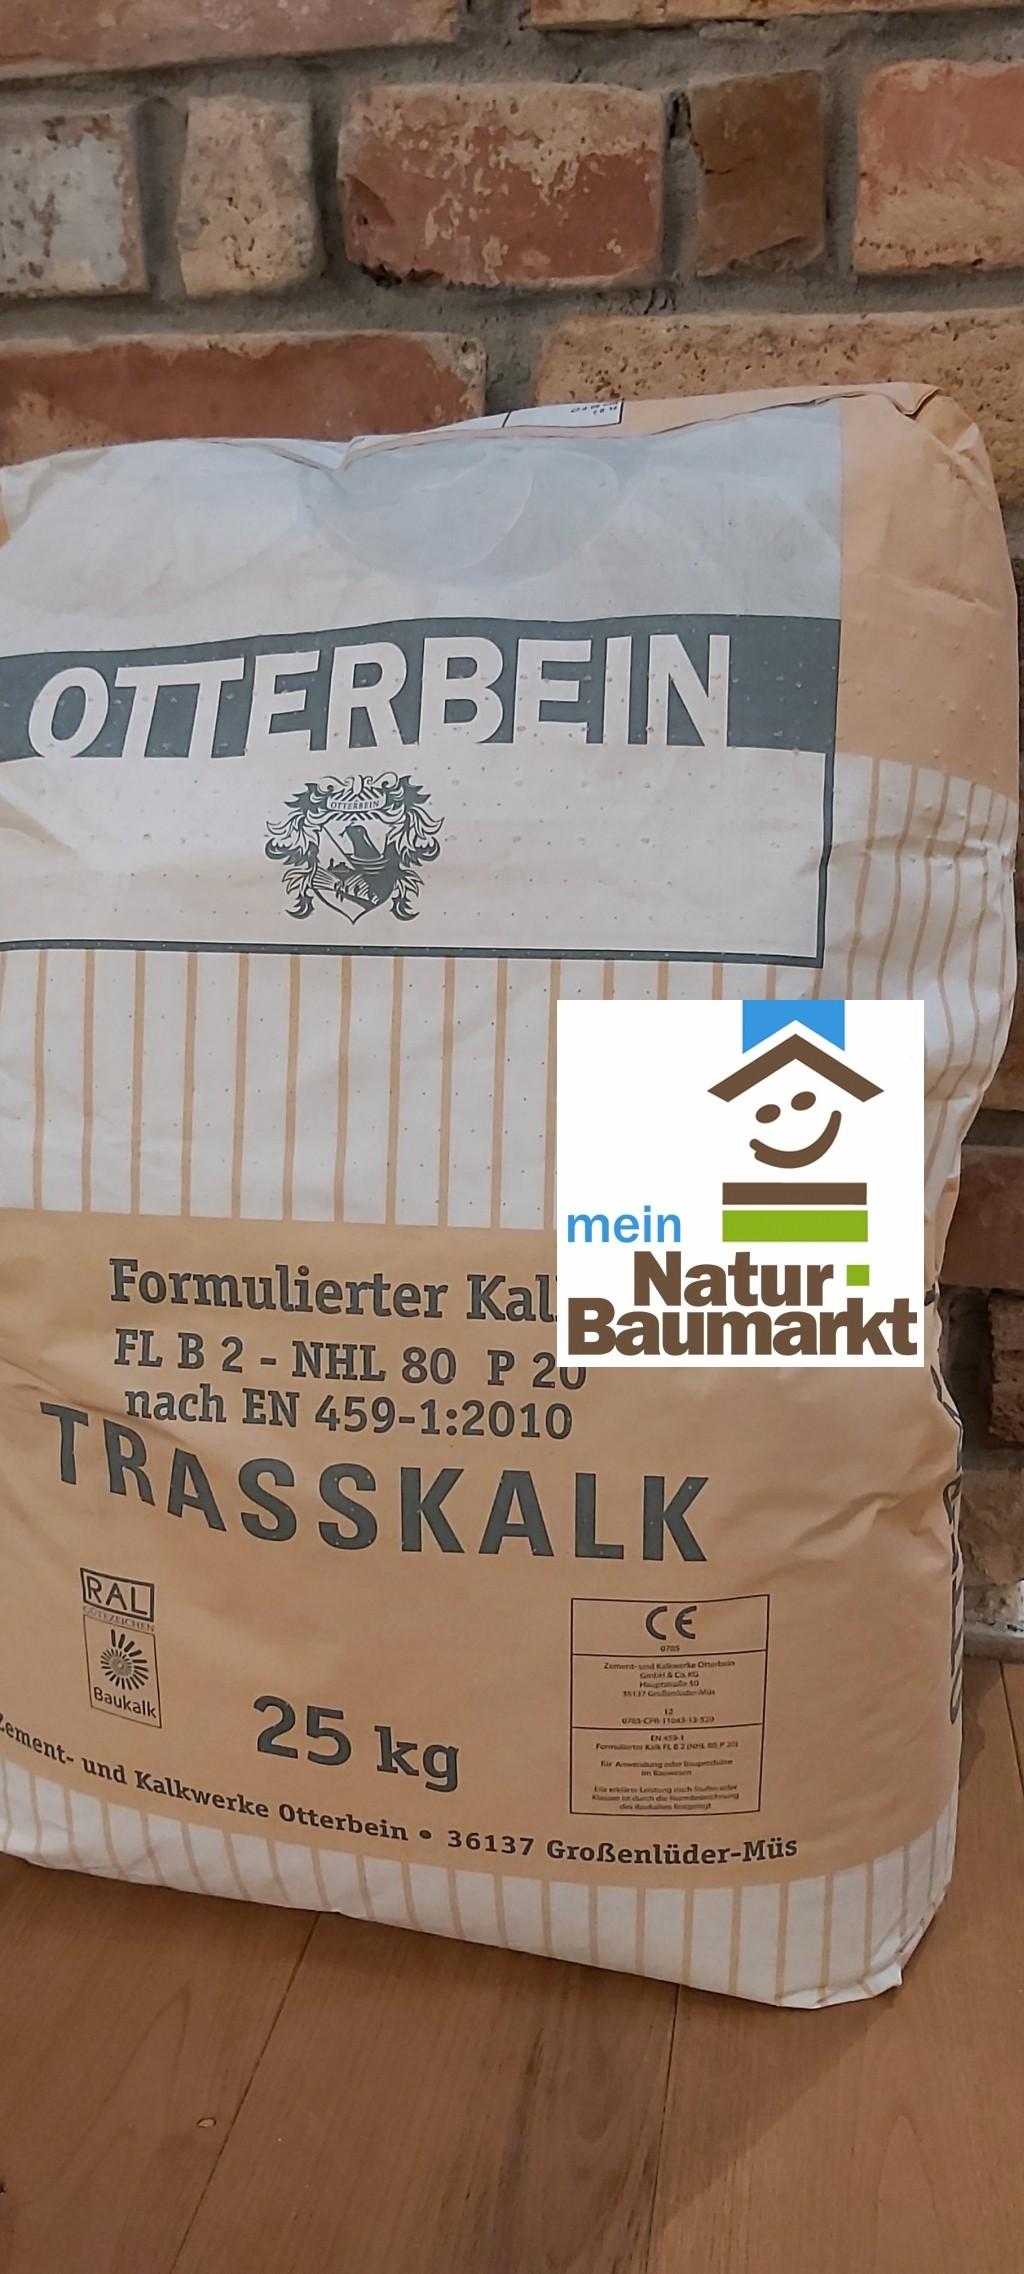 Otterbein Trasskalk – FL B 2 (NHL 80, P 20) 25 kg Sack